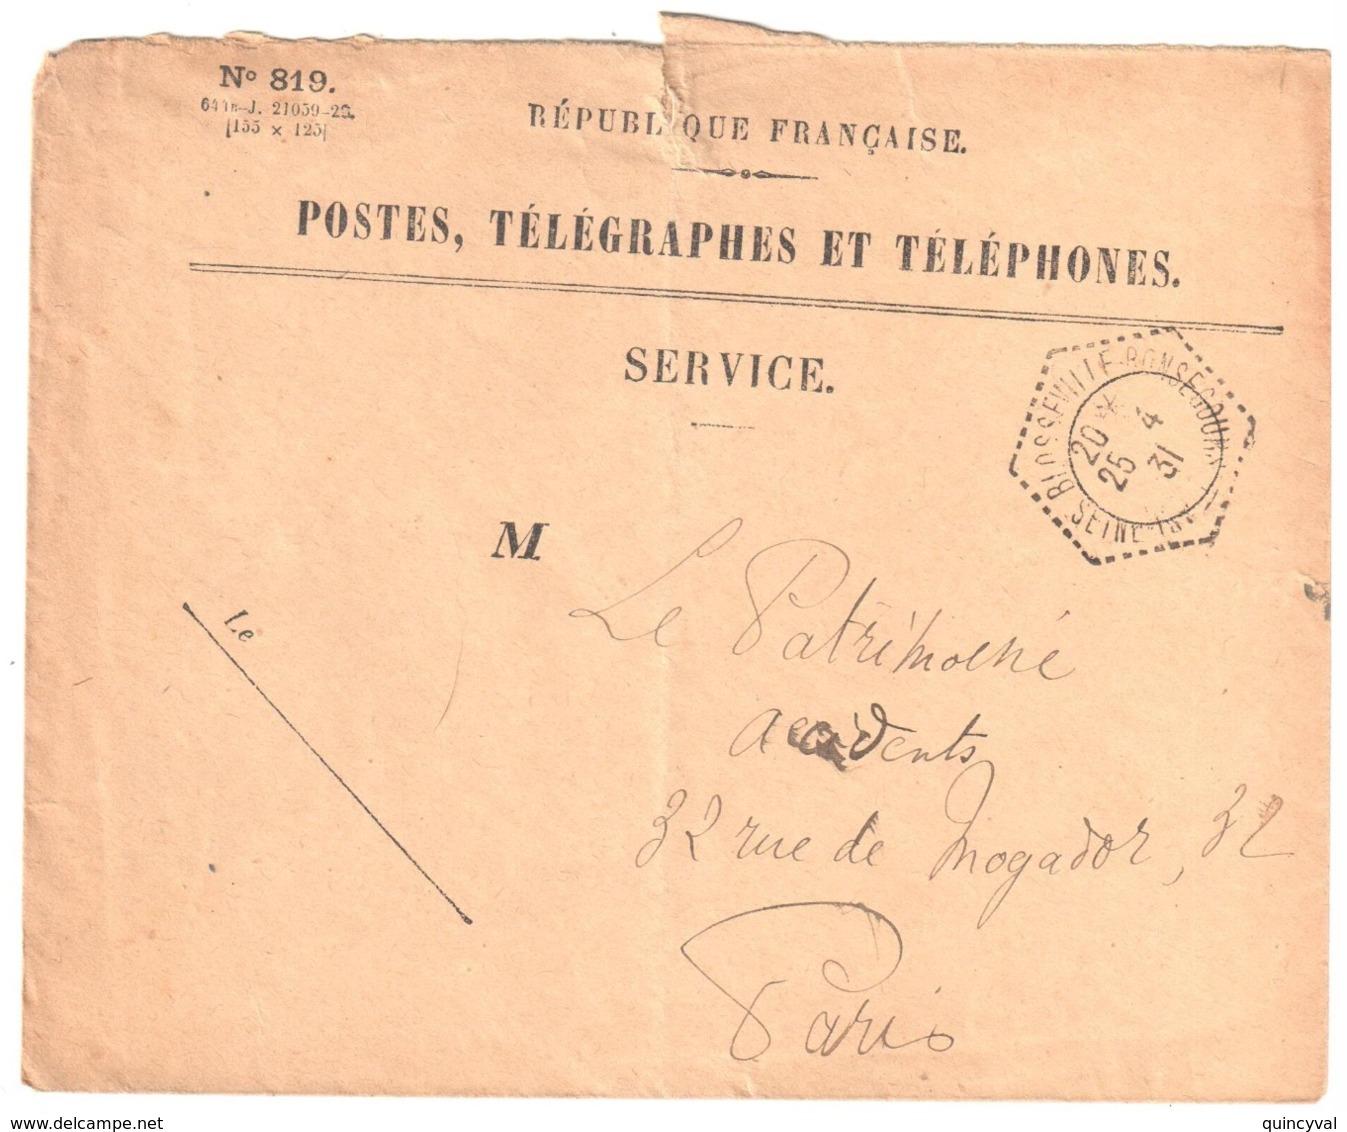 BLOSSEVILLE BONSECOURS Seine Inf Enveloppe SERVICE N° 819 Franchise Ob 1931 Agence Postale Hexagone Pointillé Lautier F4 - Marcophilie (Lettres)